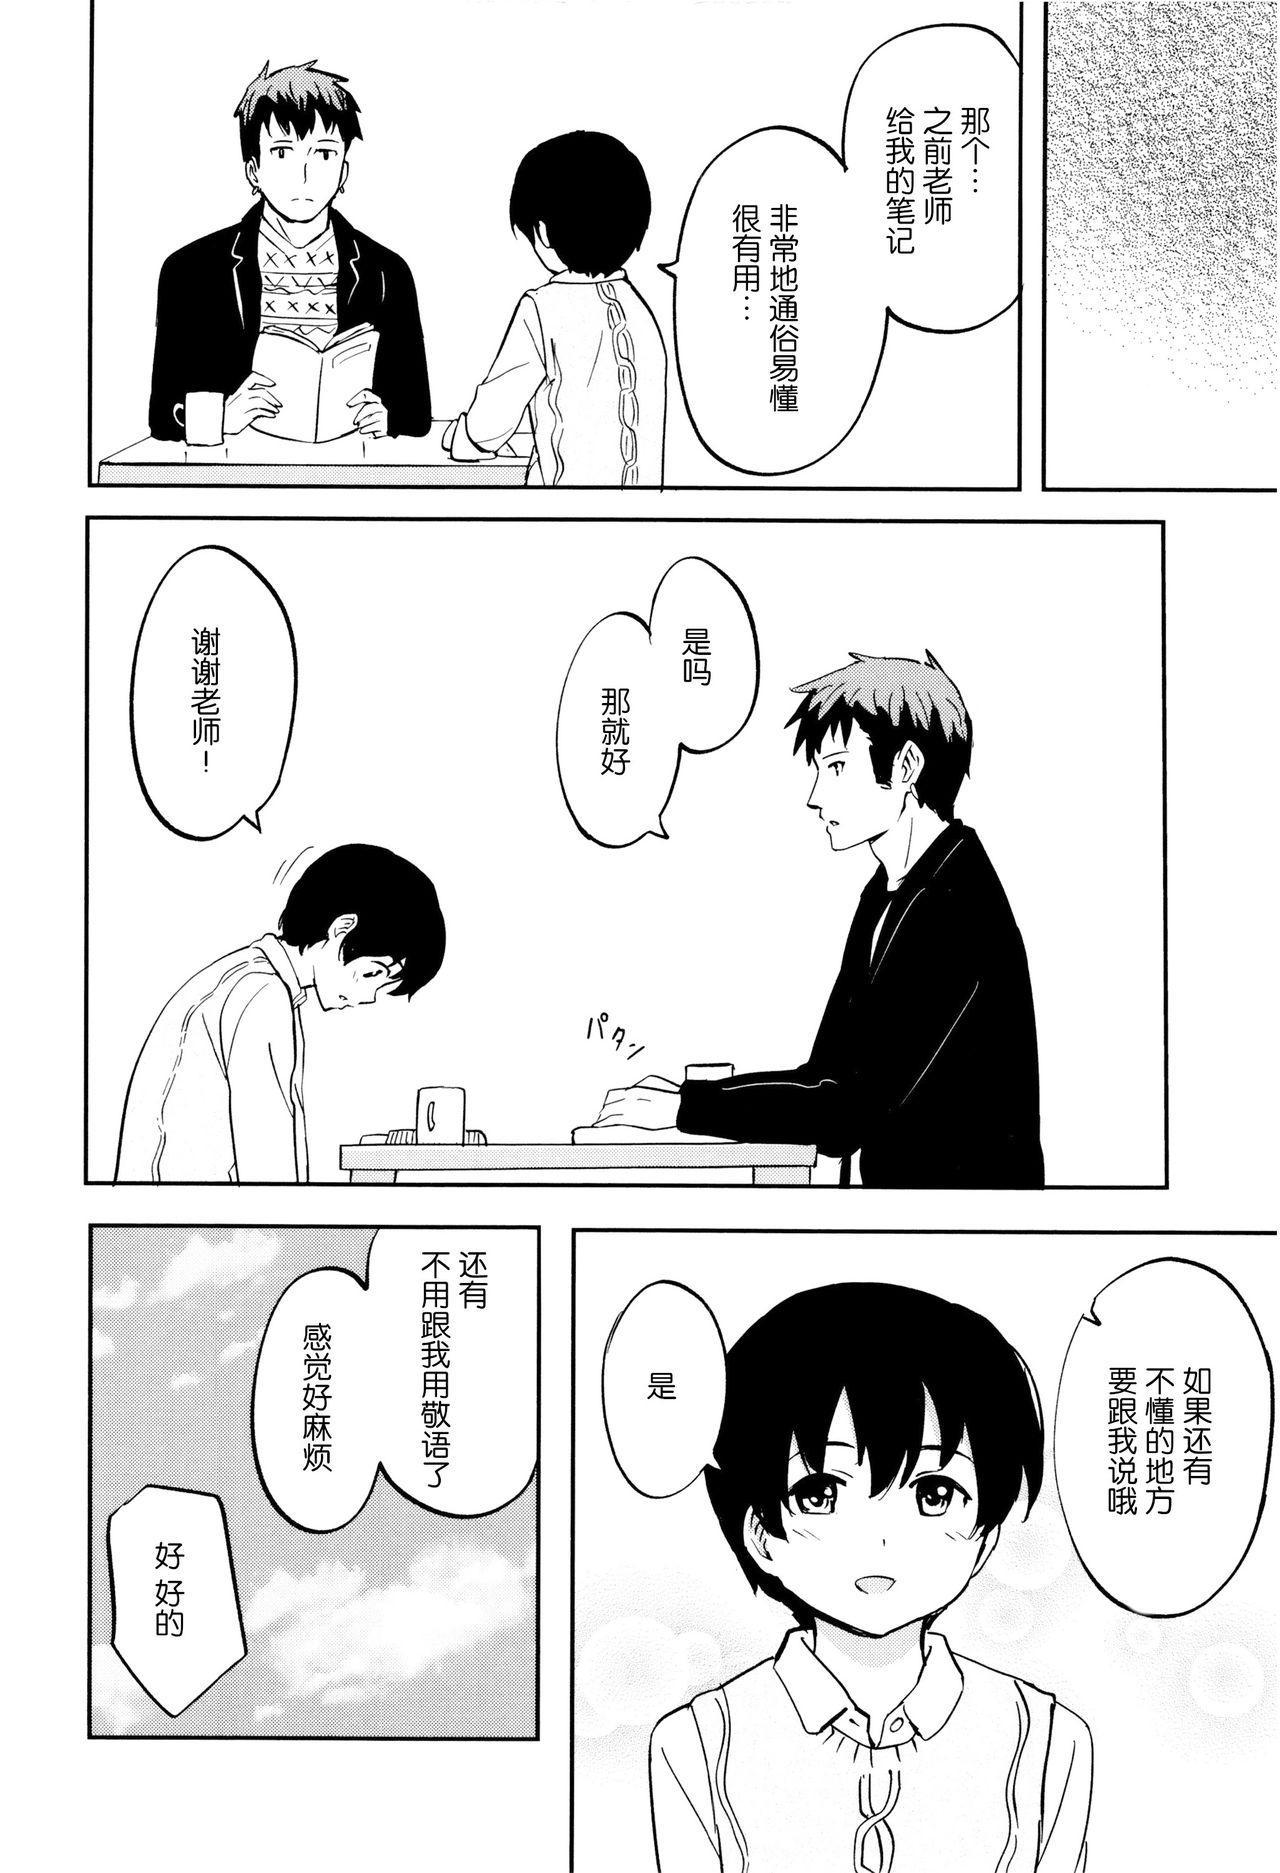 Tokubetsu na Mainichi - Special daily 138